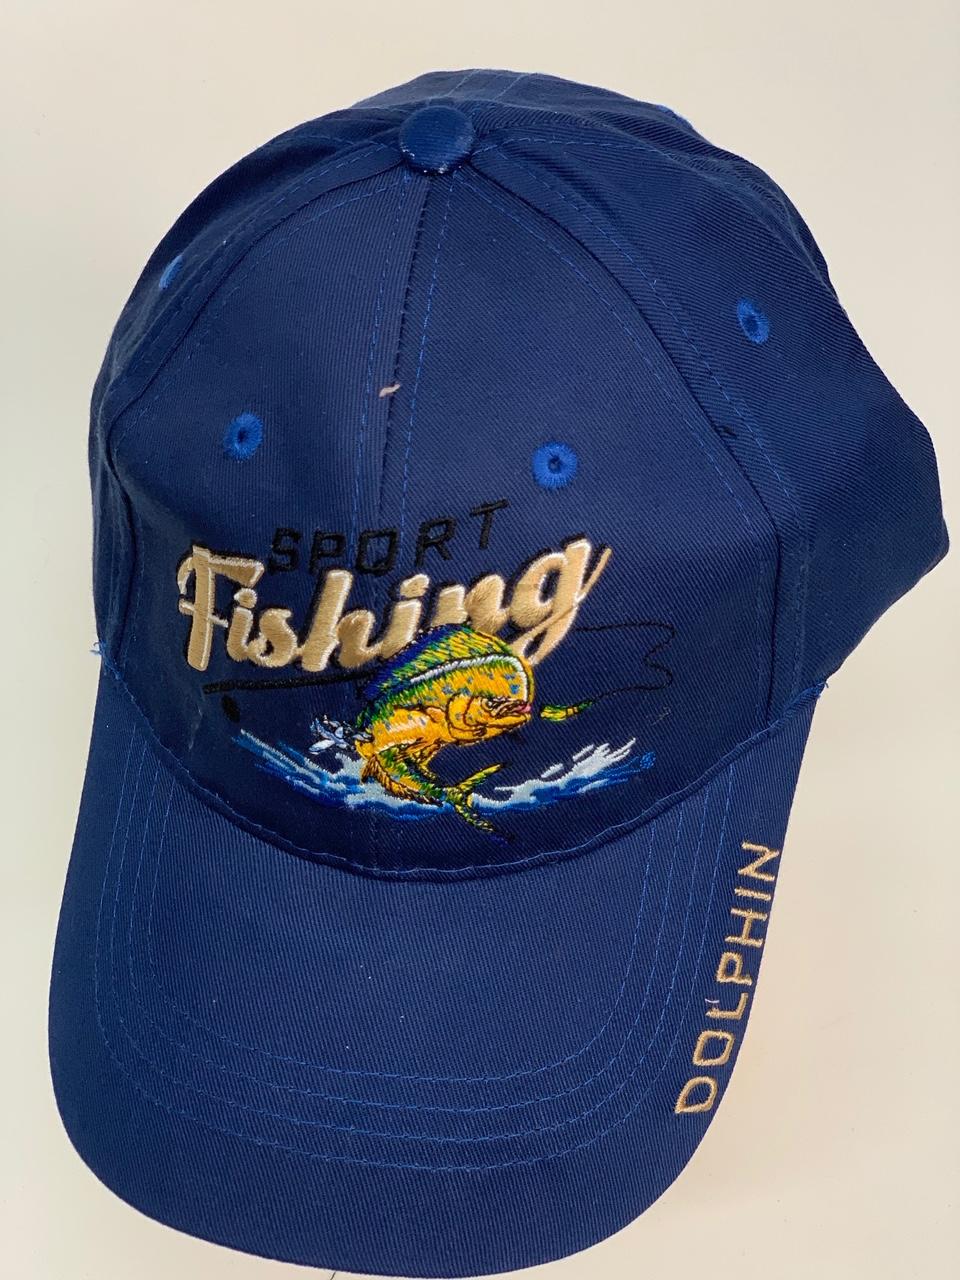 Бейсболка Sport fishing темно-синего цвета